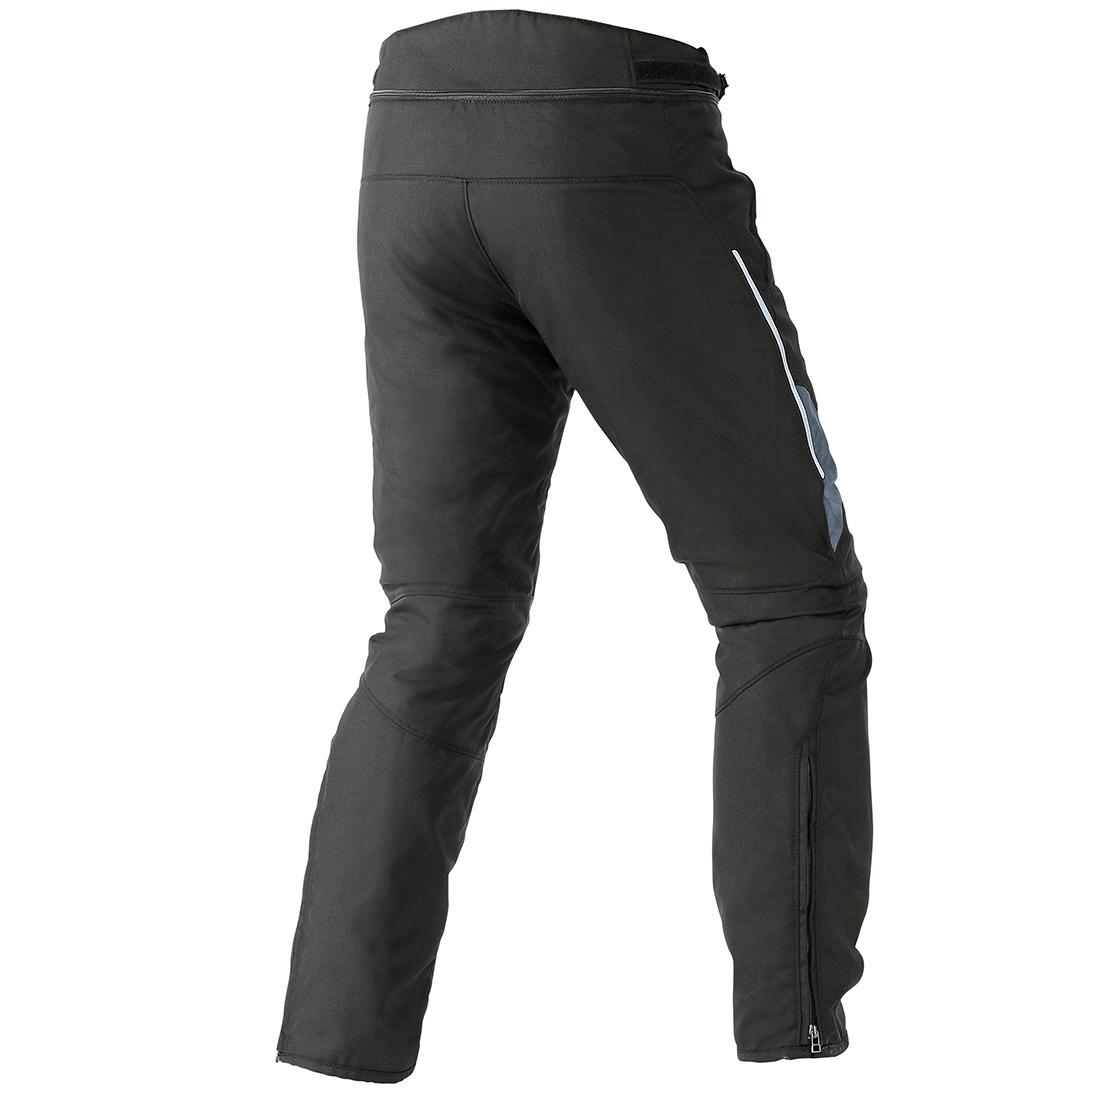 【DAINESE】P.TEMPEST D-DRY車褲 - 「Webike-摩托百貨」